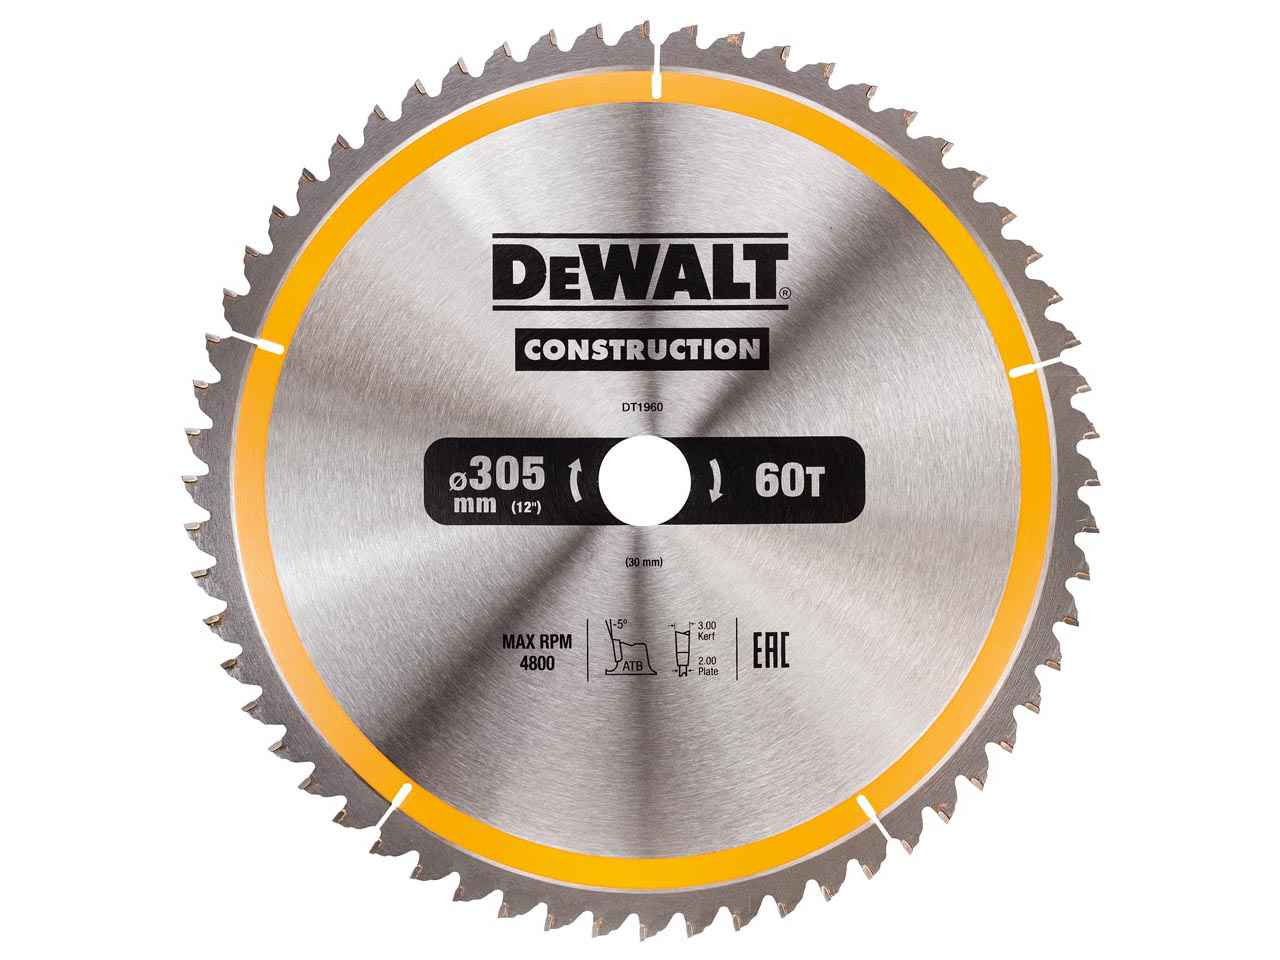 Dewalt dt1960qz construction circular saw blade 305x30mm 60t greentooth Choice Image